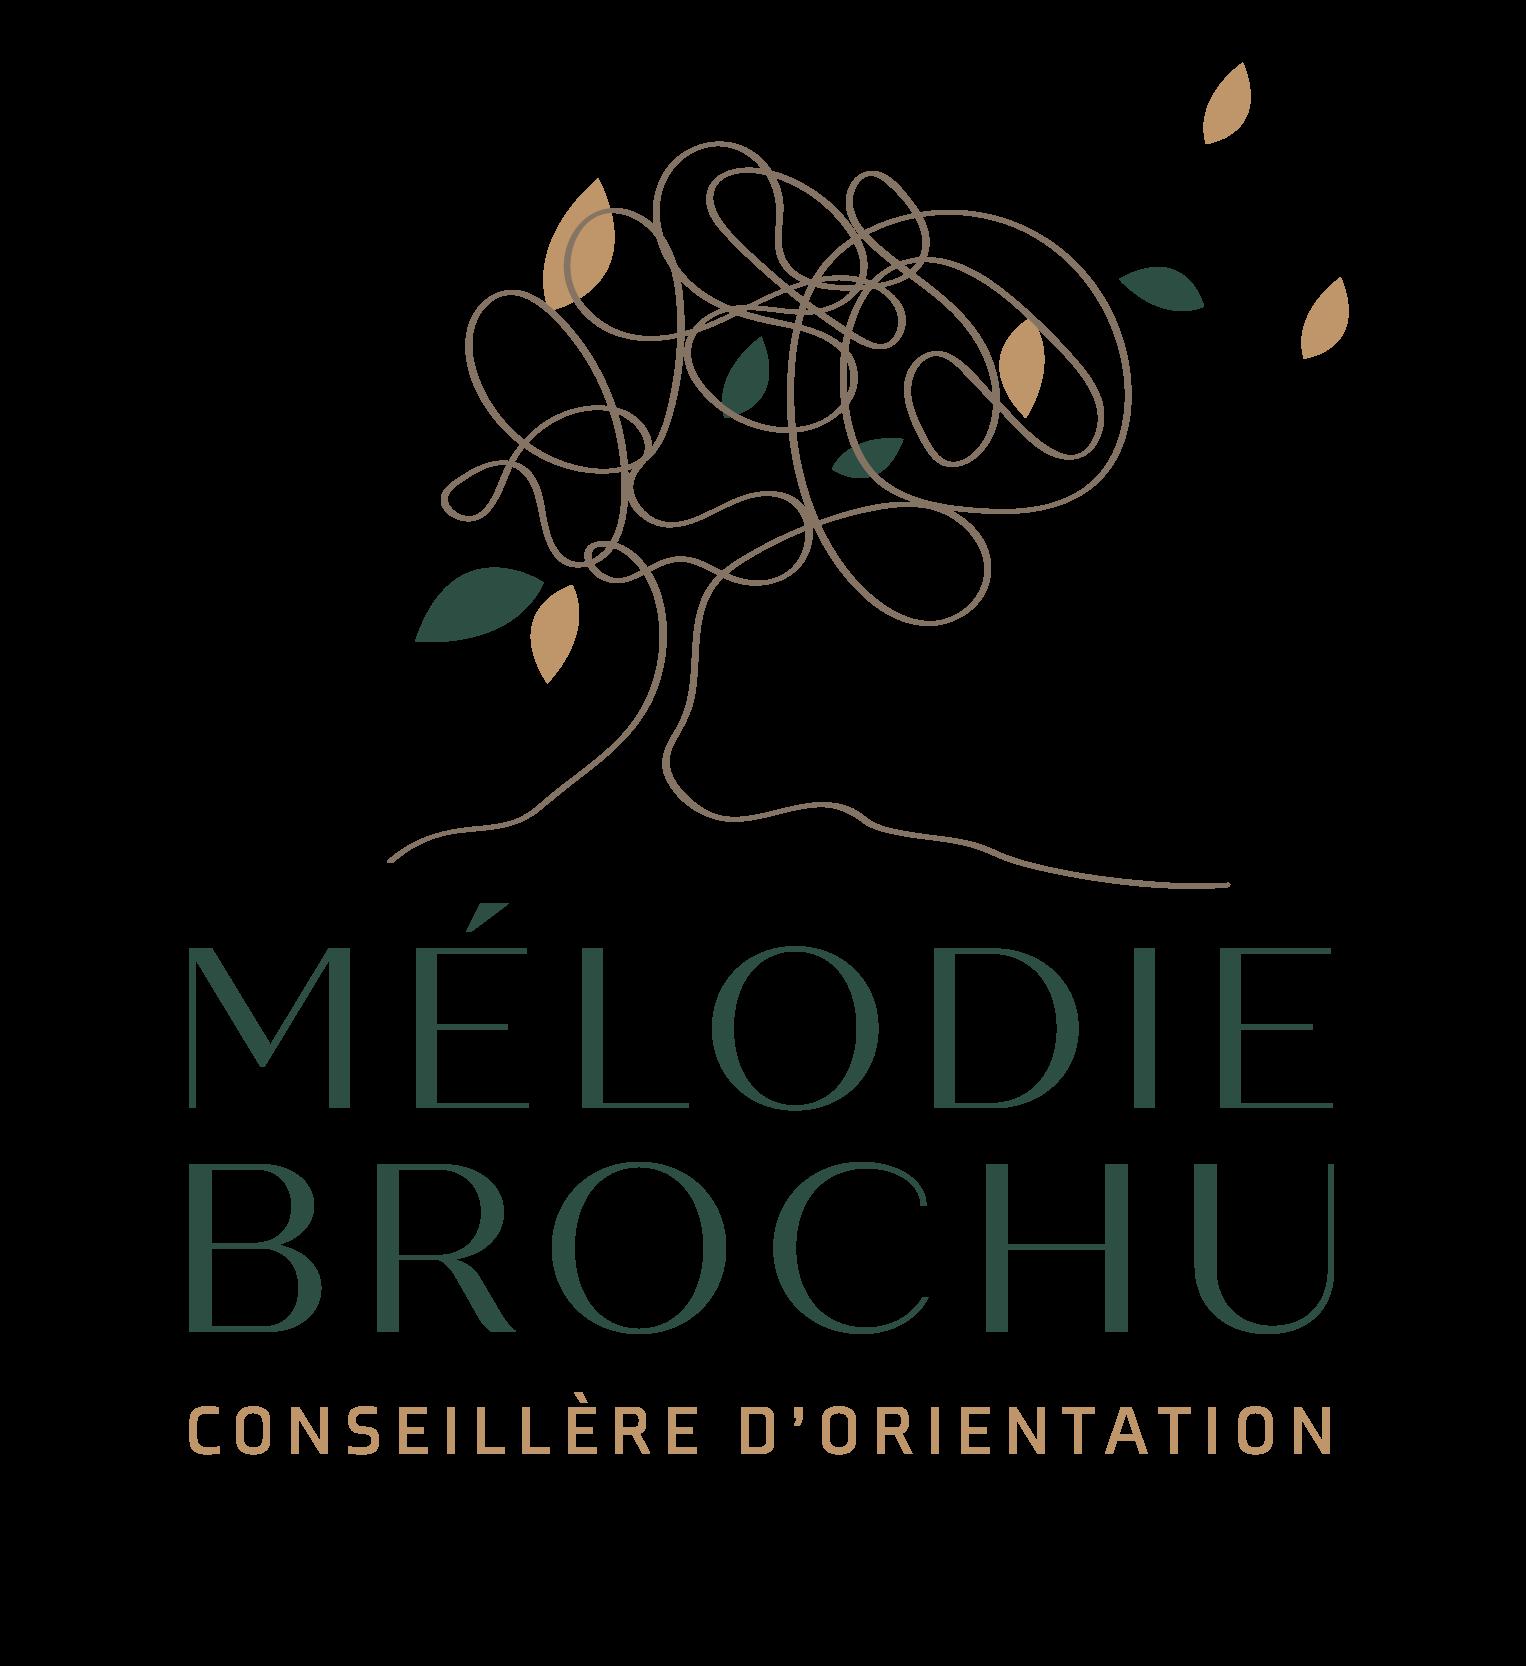 Mélodie Brochu, conseillère d'orientation